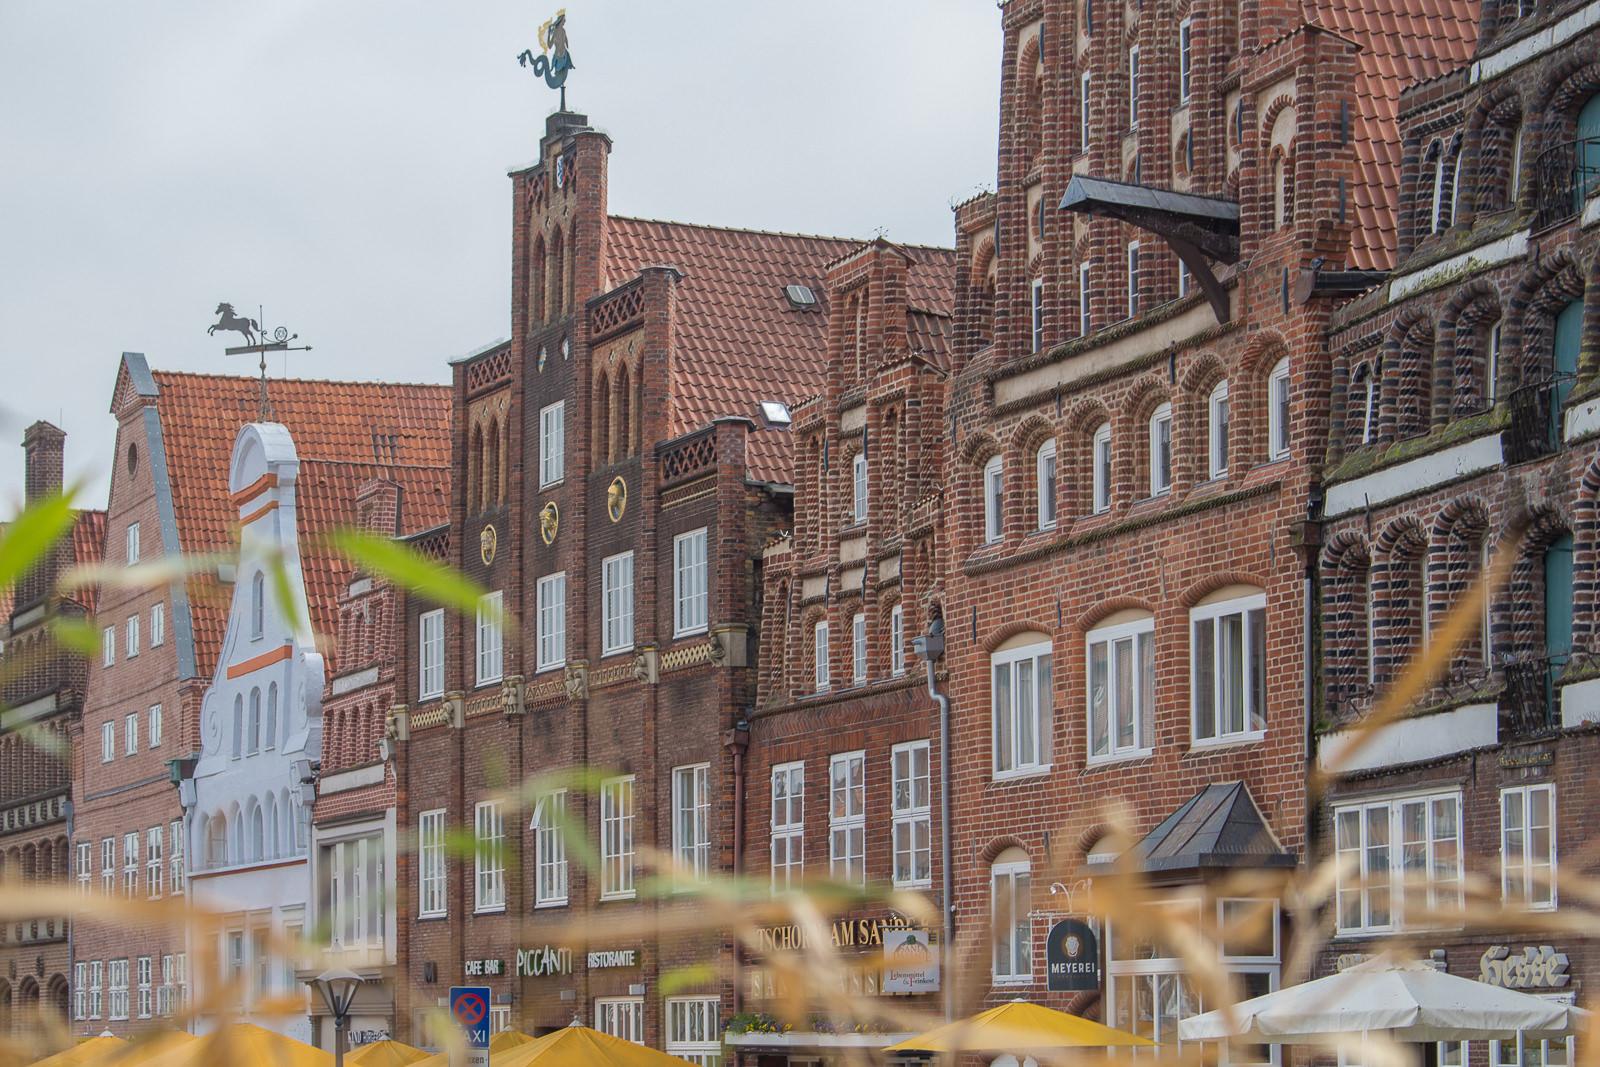 Lüneburger Heide, Tee, Lueneburg, Lüneburg